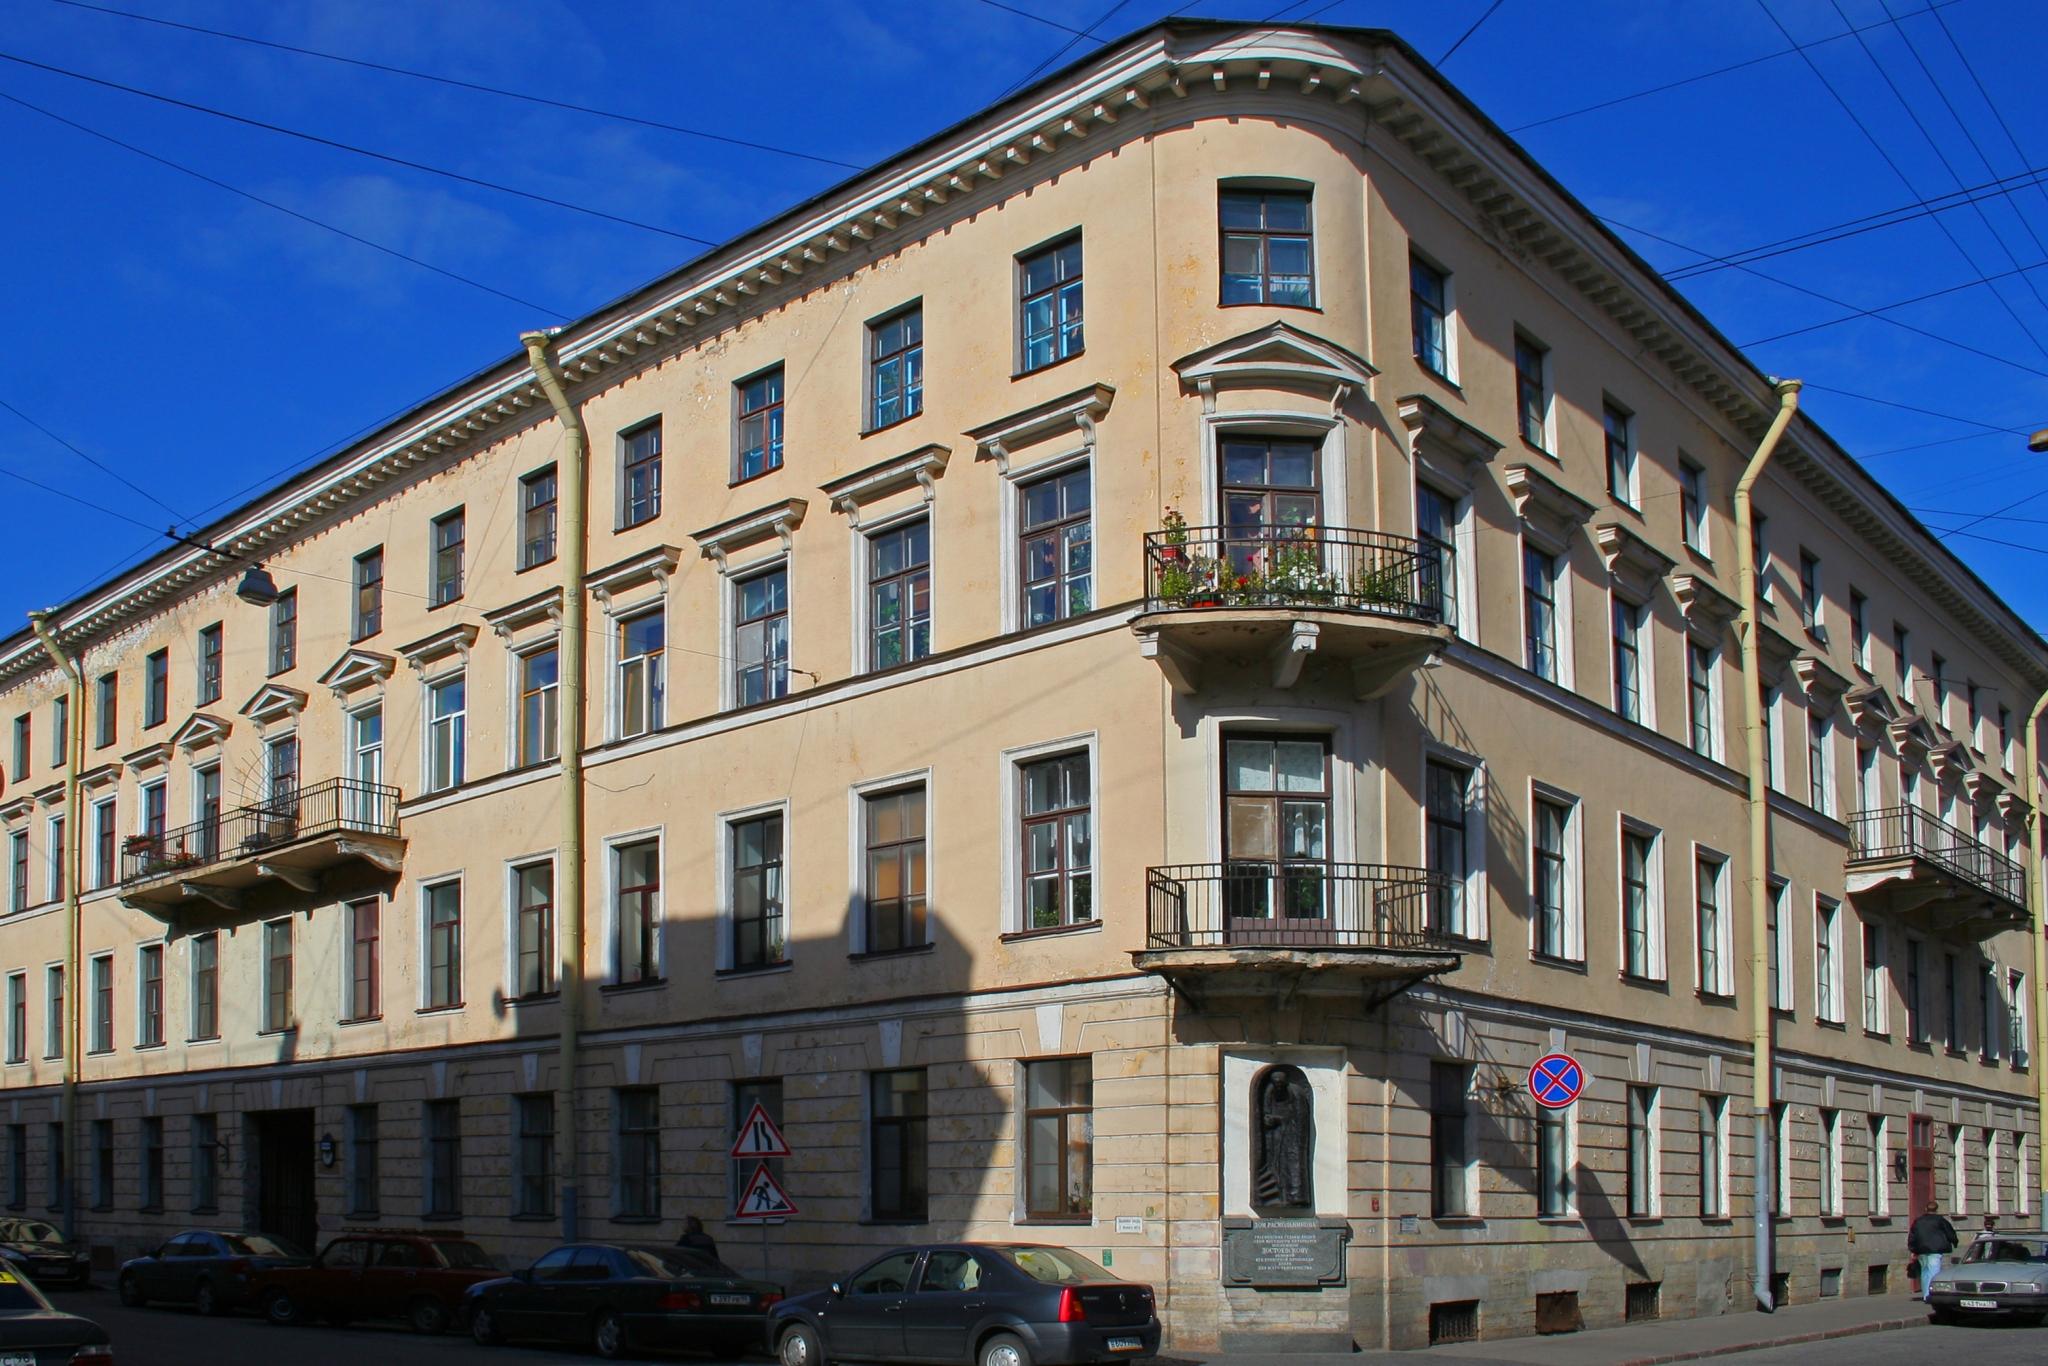 maison raskolnikov Petersbourg dostoievski crime châtiment